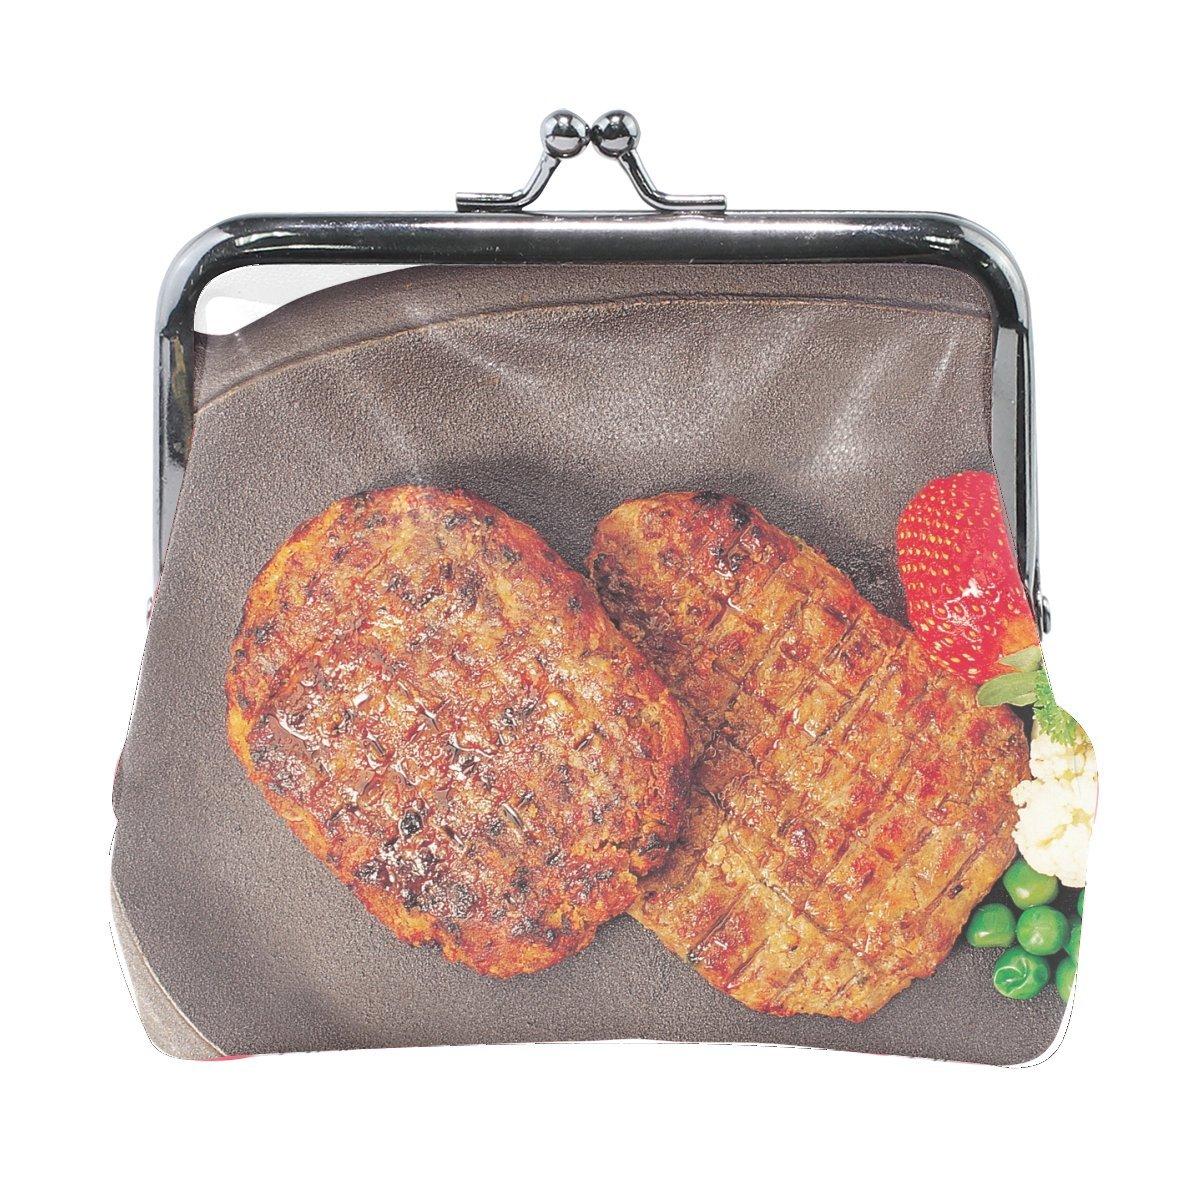 Women Chops Meat Fried Foods Vegetables Print Wallet Exquisite Clasp Coin Purse Girls Clutch Handbag